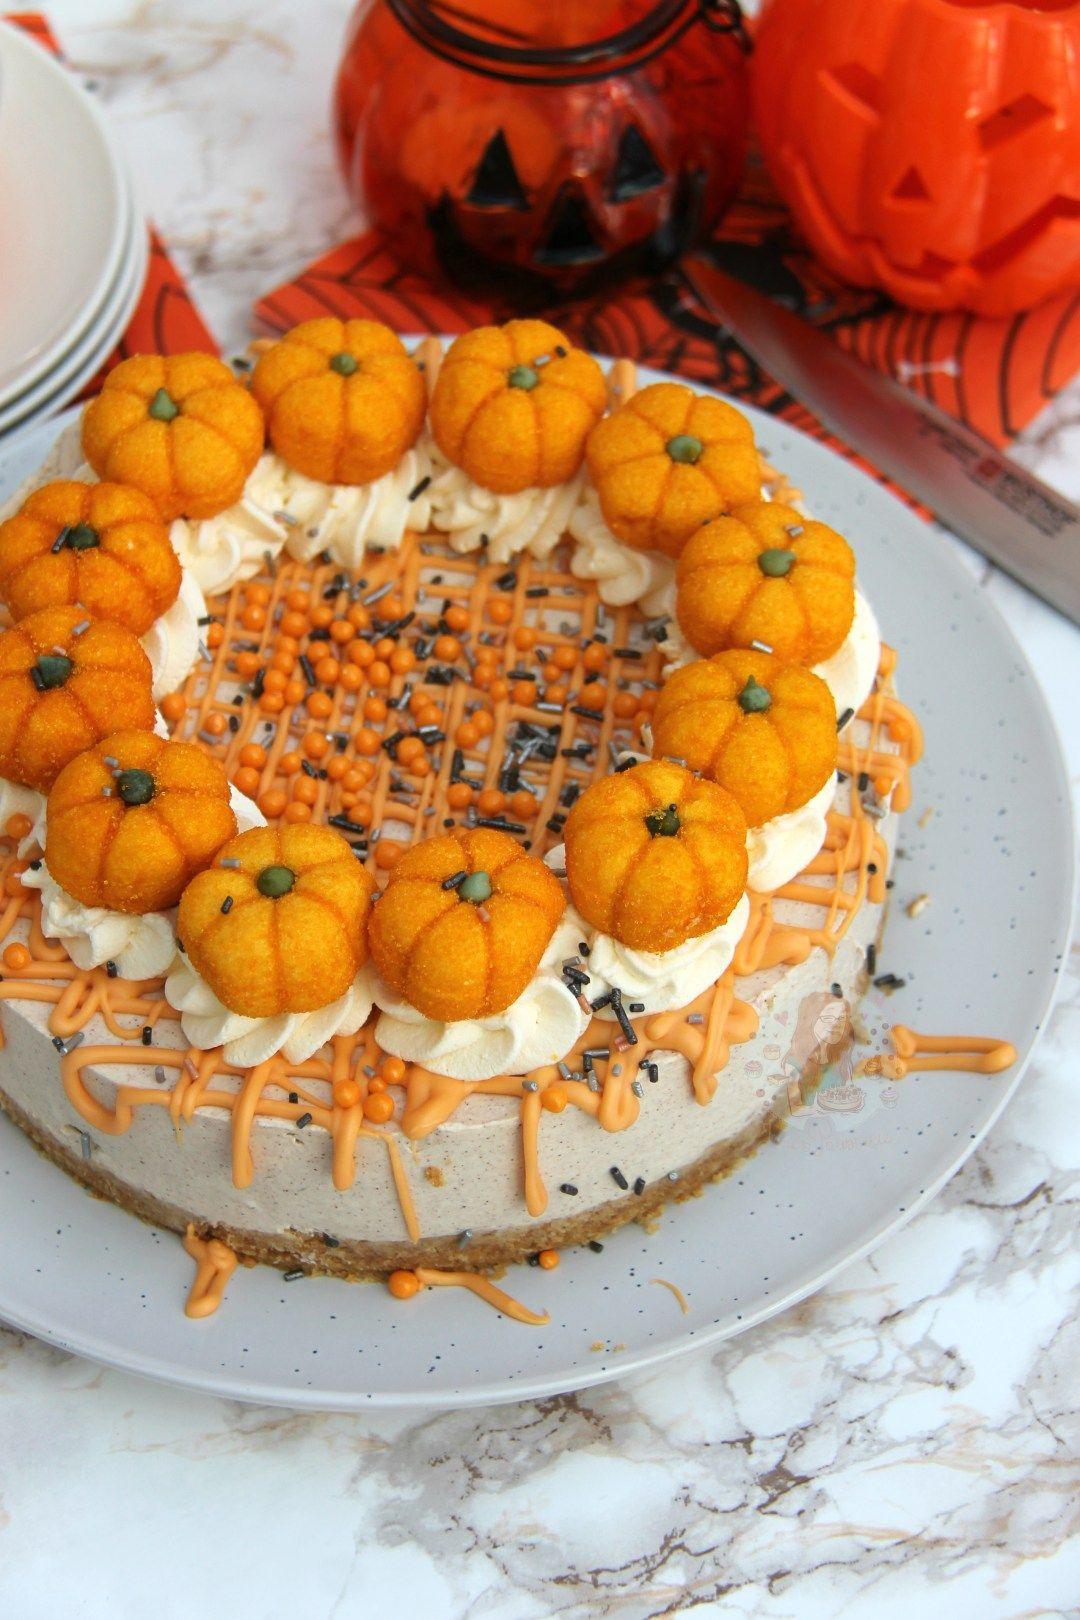 NoBake Pumpkin Spice Cheesecake! Jane's Patisserie